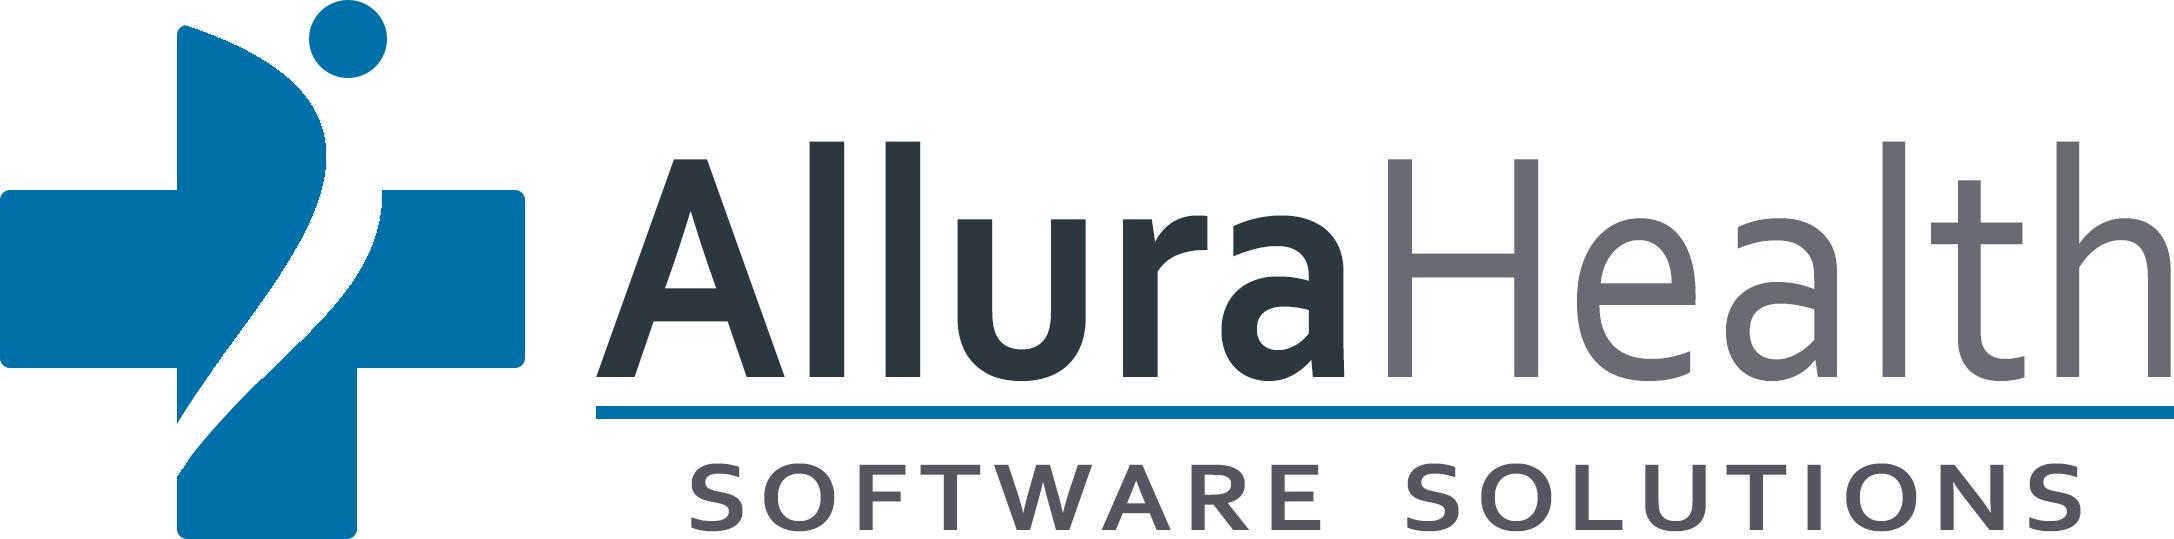 Allura Health Software Solutions